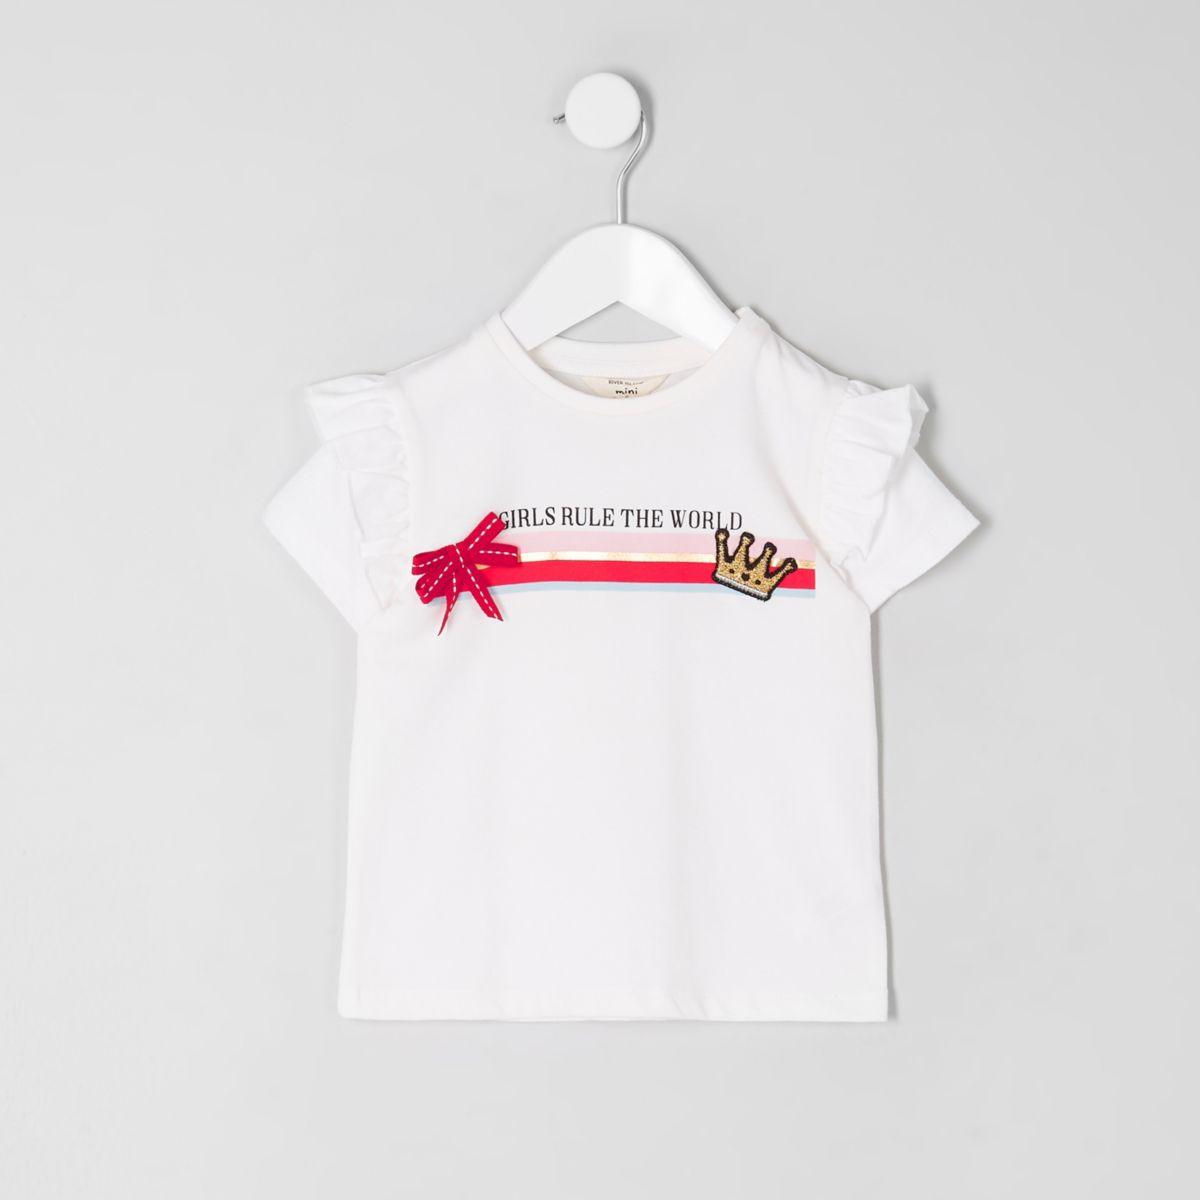 Mini girls 'rule the world' T-shirt